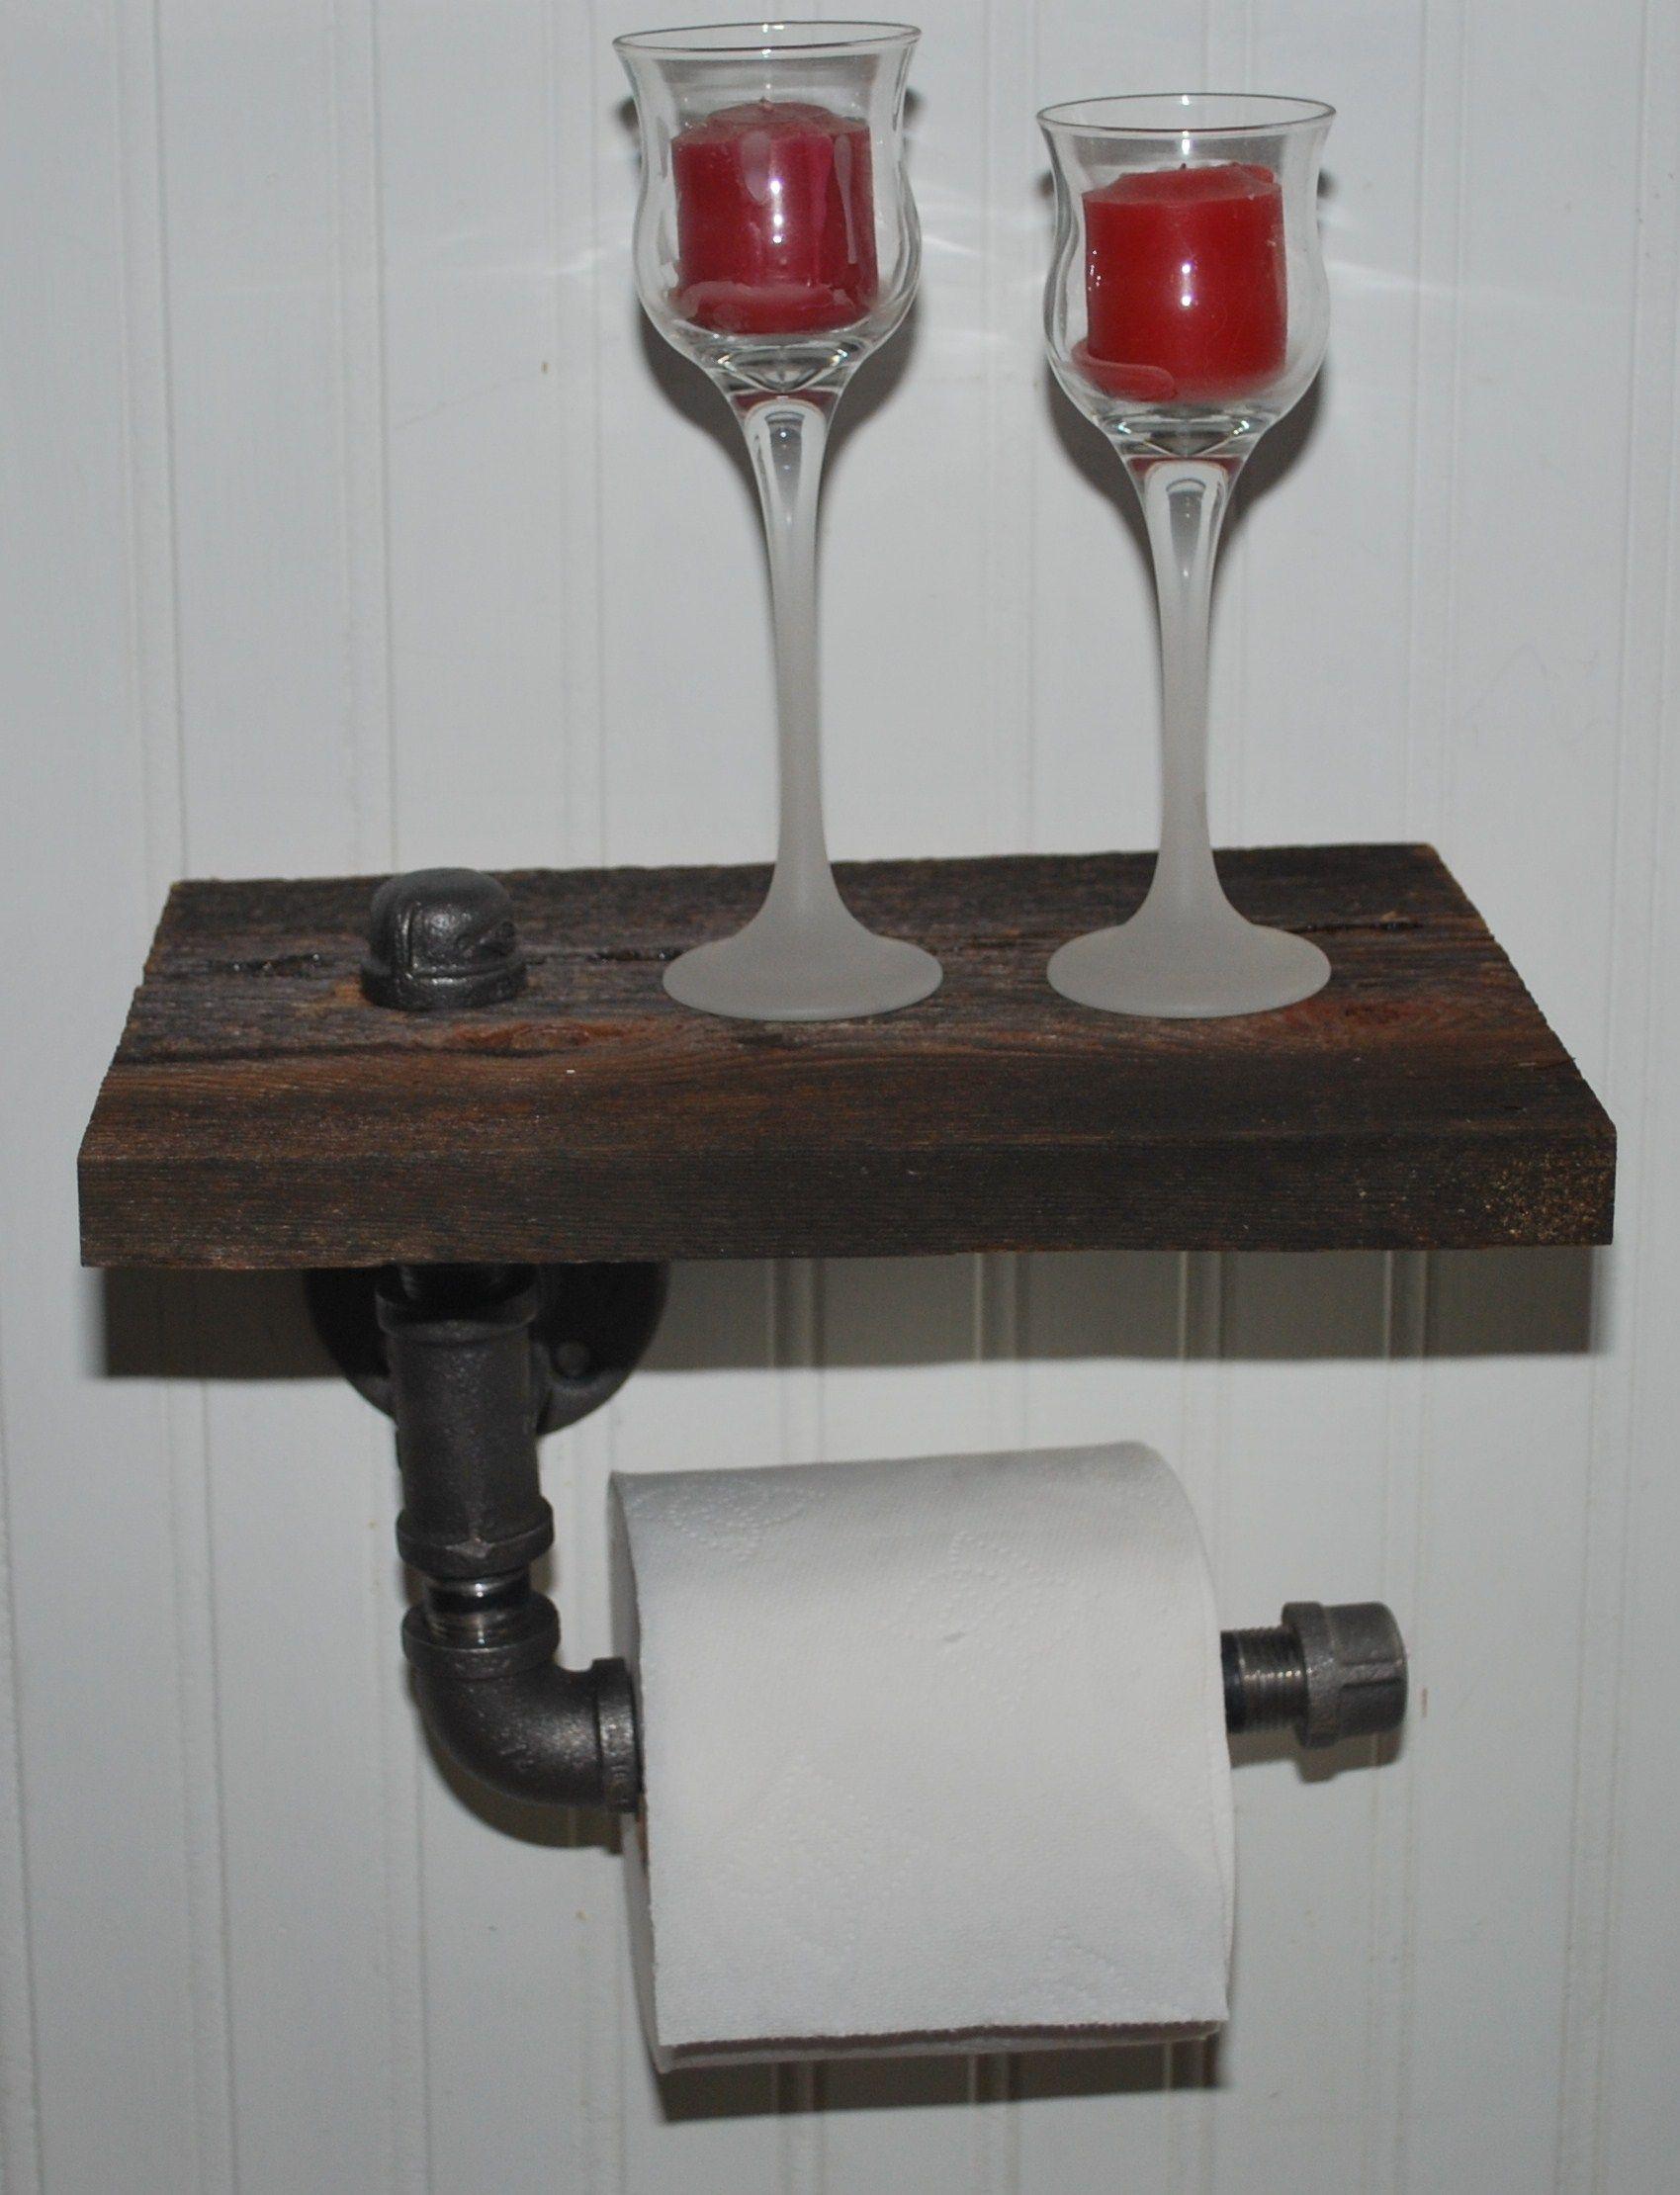 Buy A Handmade Rustic Barnwood Toilet Paper Holder Made